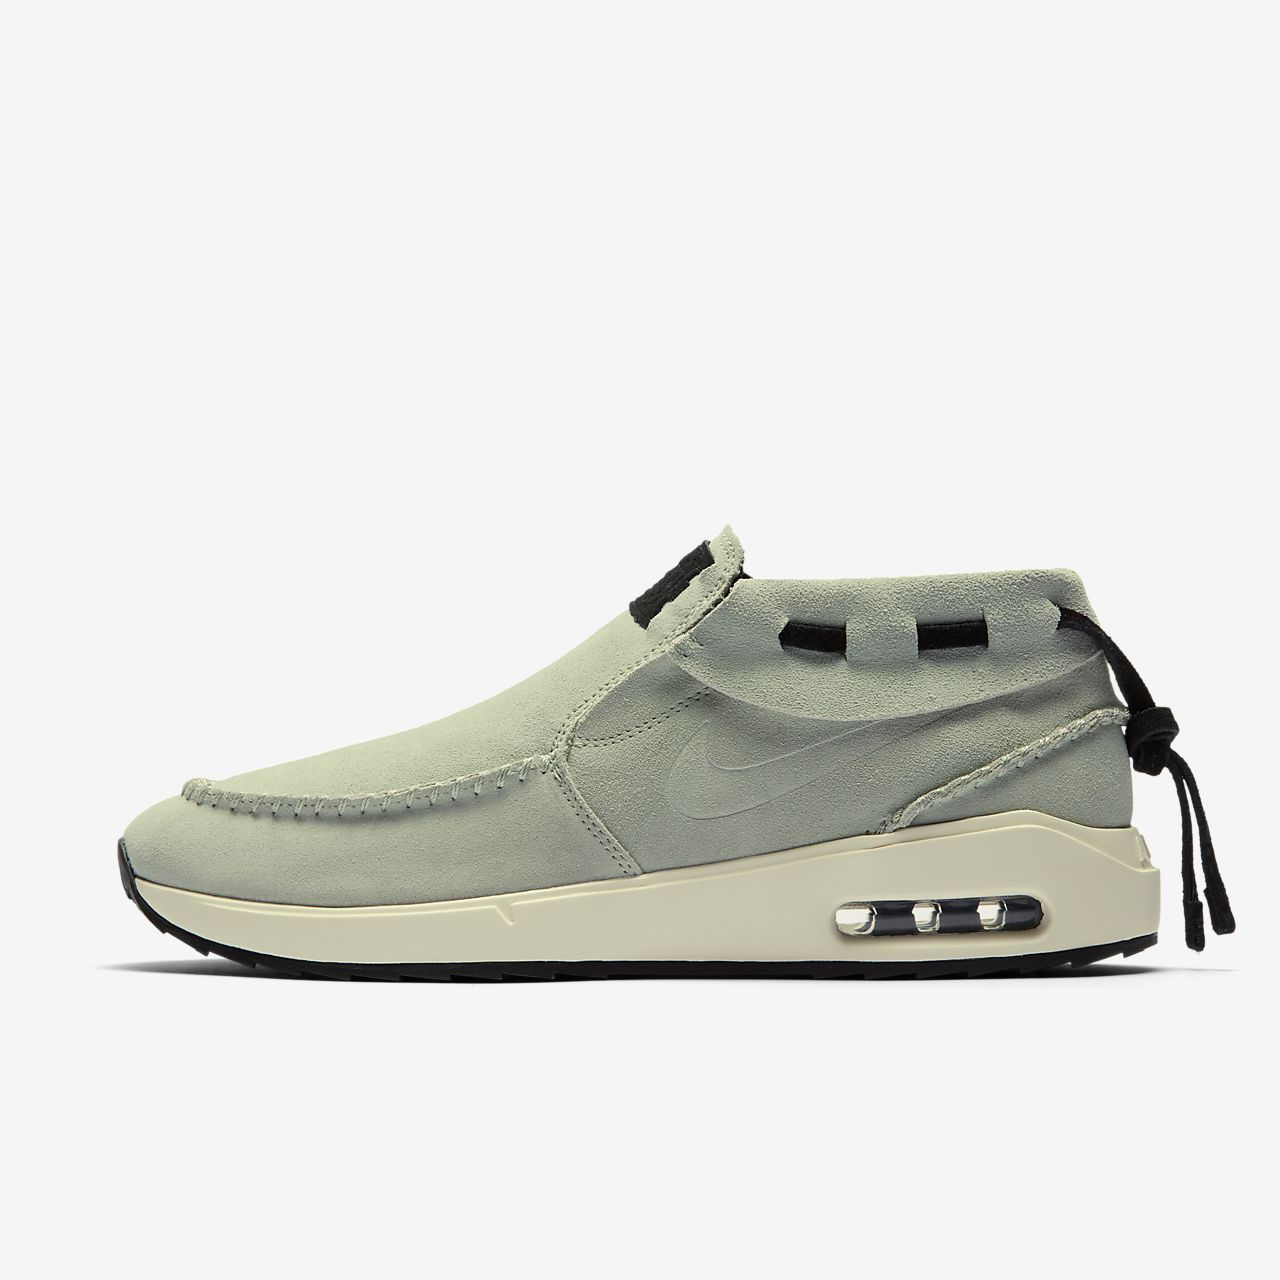 Chaussure de skateboard Nike SB Air Max Stefan Janoski 2 Moc